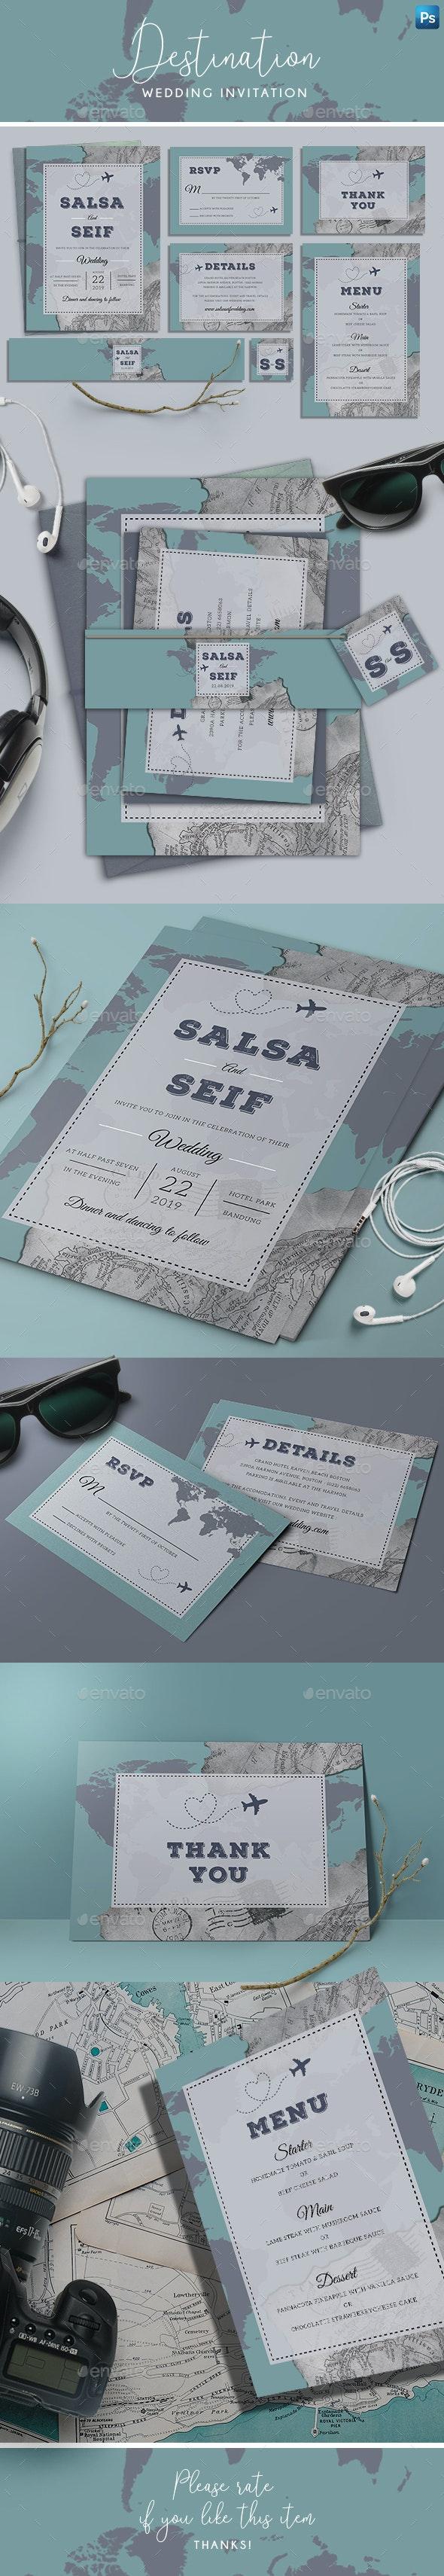 Destination Wedding Invitation - Weddings Cards & Invites